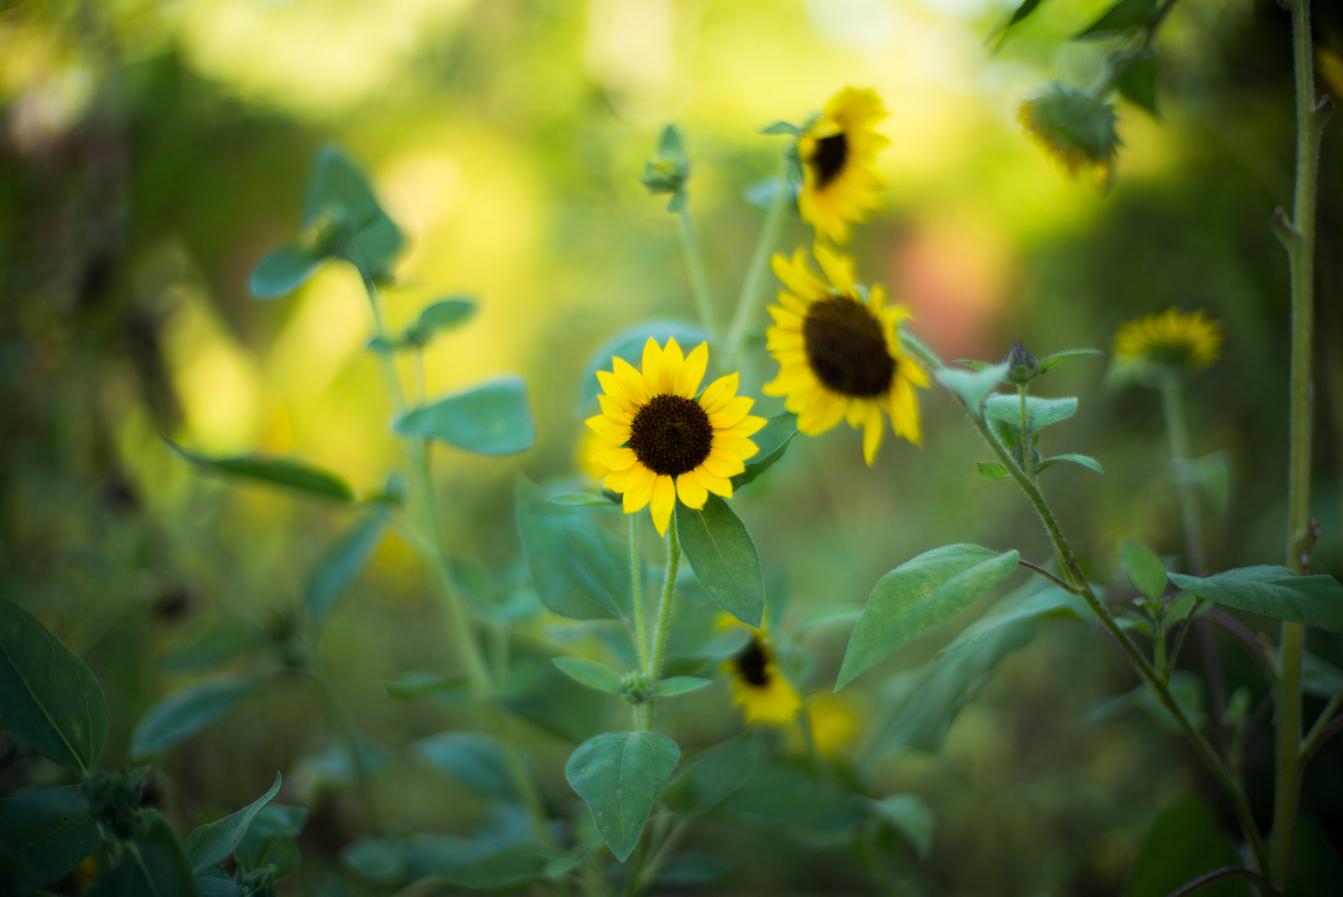 flores_jardin2.jpg